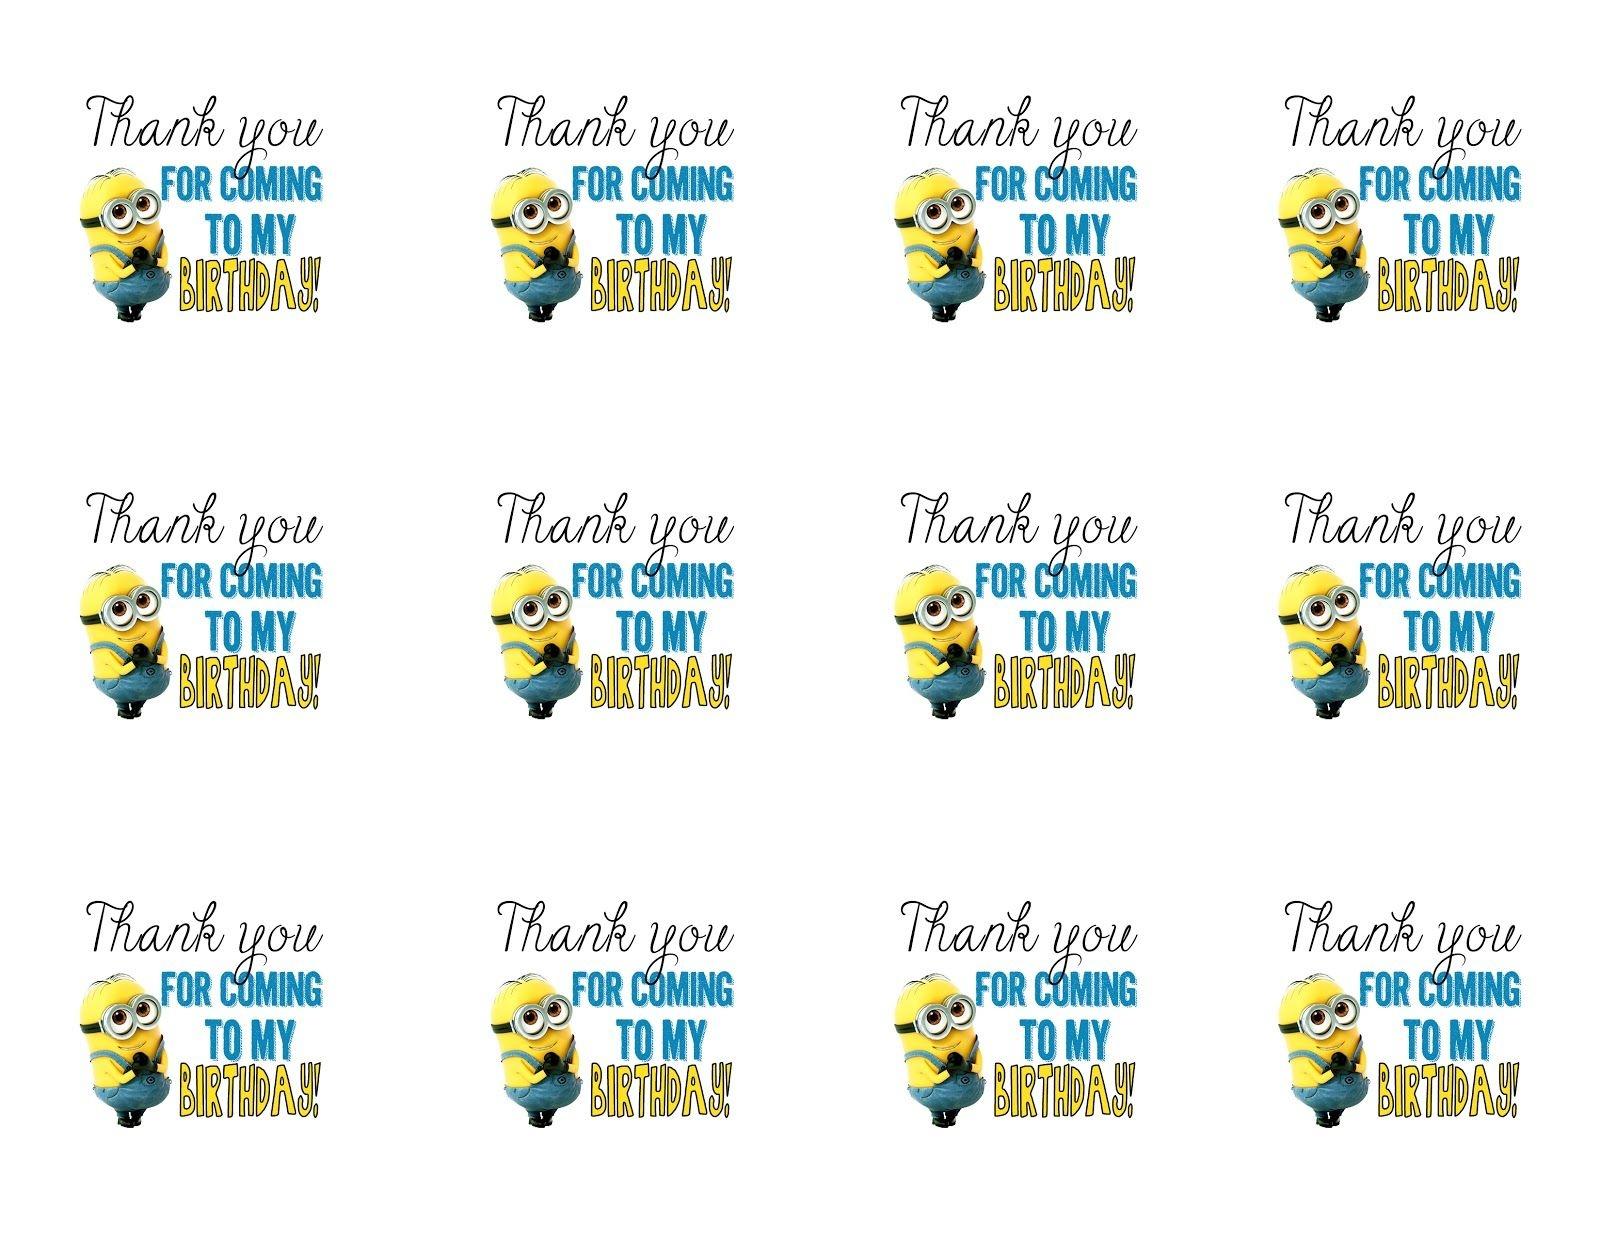 Diy Design Den: Minion Birthday Party With Free Printables. | Minion - Free Printable Minion Food Labels